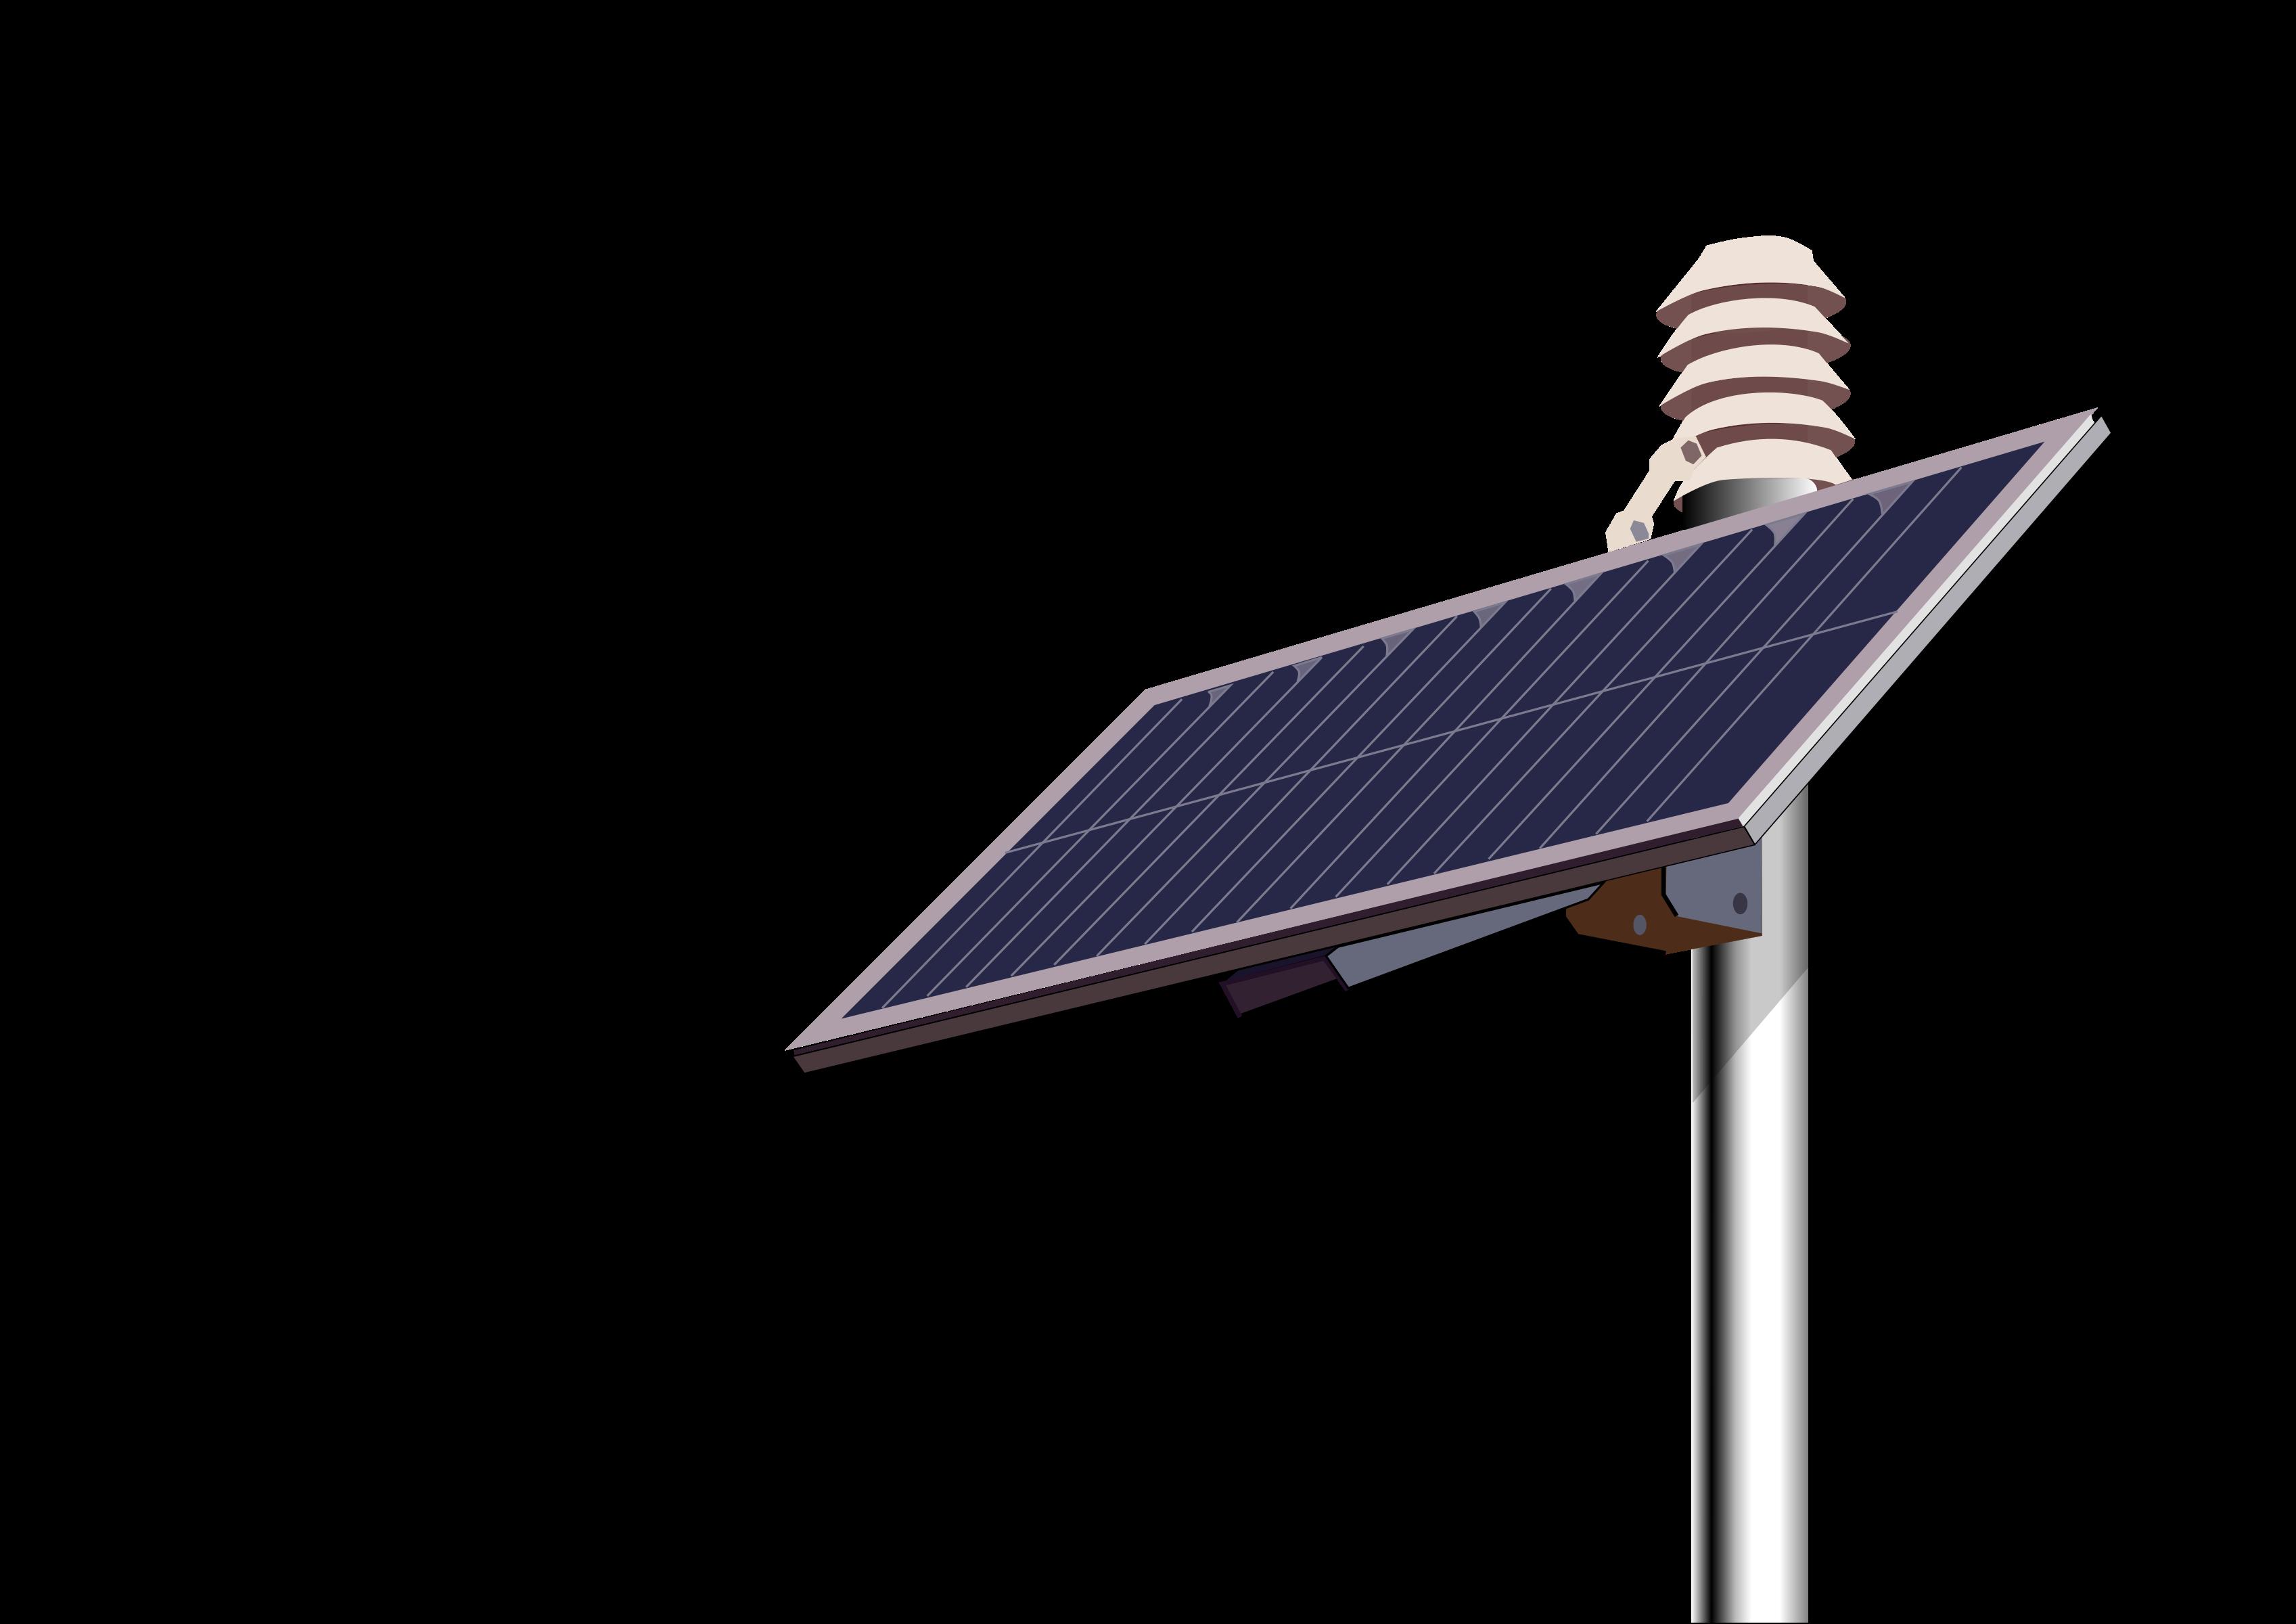 solar panel by pirx